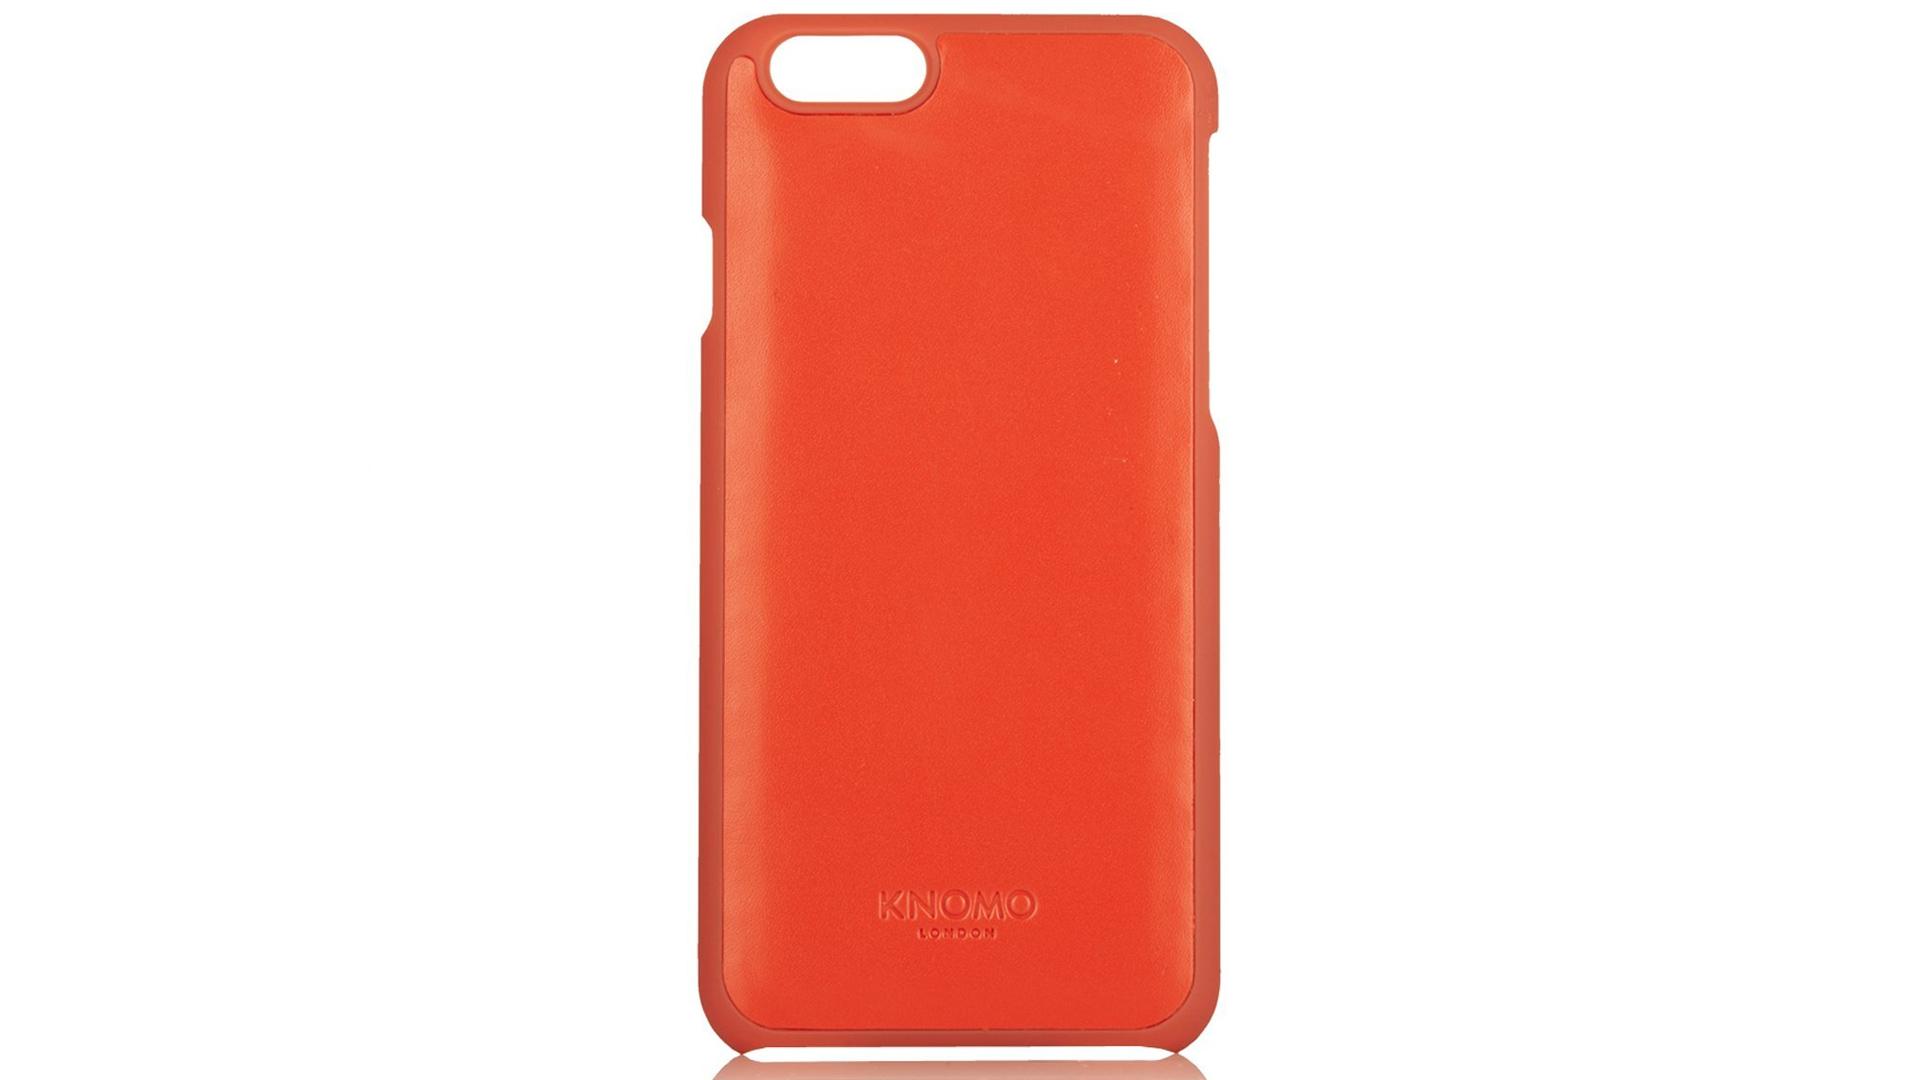 RAsHVcV4nAG4dnADCh3WJP - The best iPhone 7 Plus cases